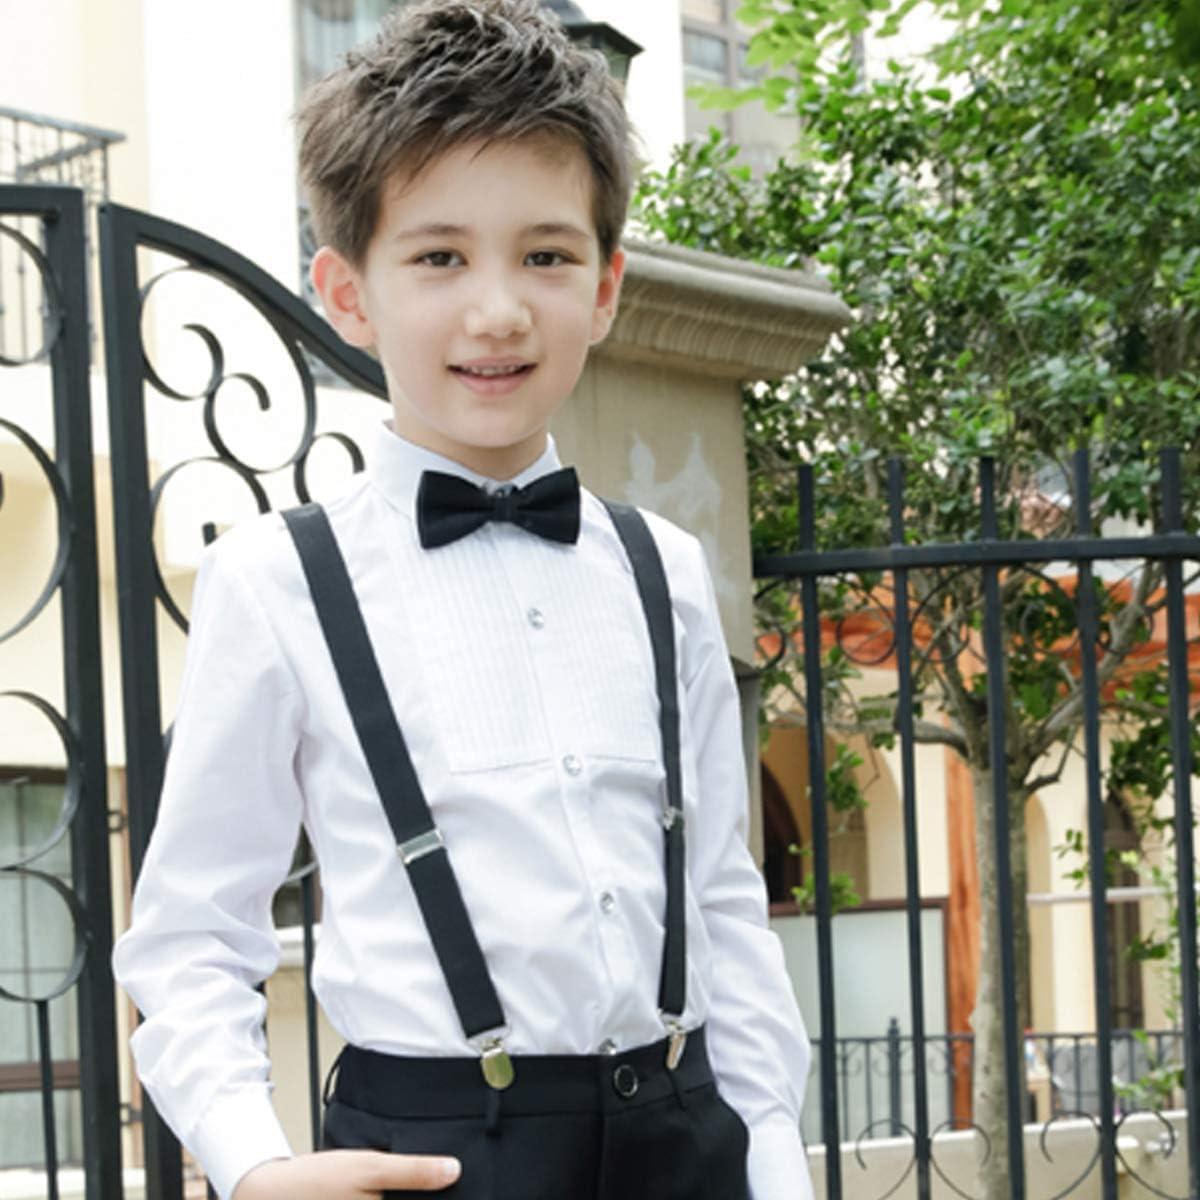 NUOBESTY Juego de corbata con tirantes de corbata negra, ropa de ...